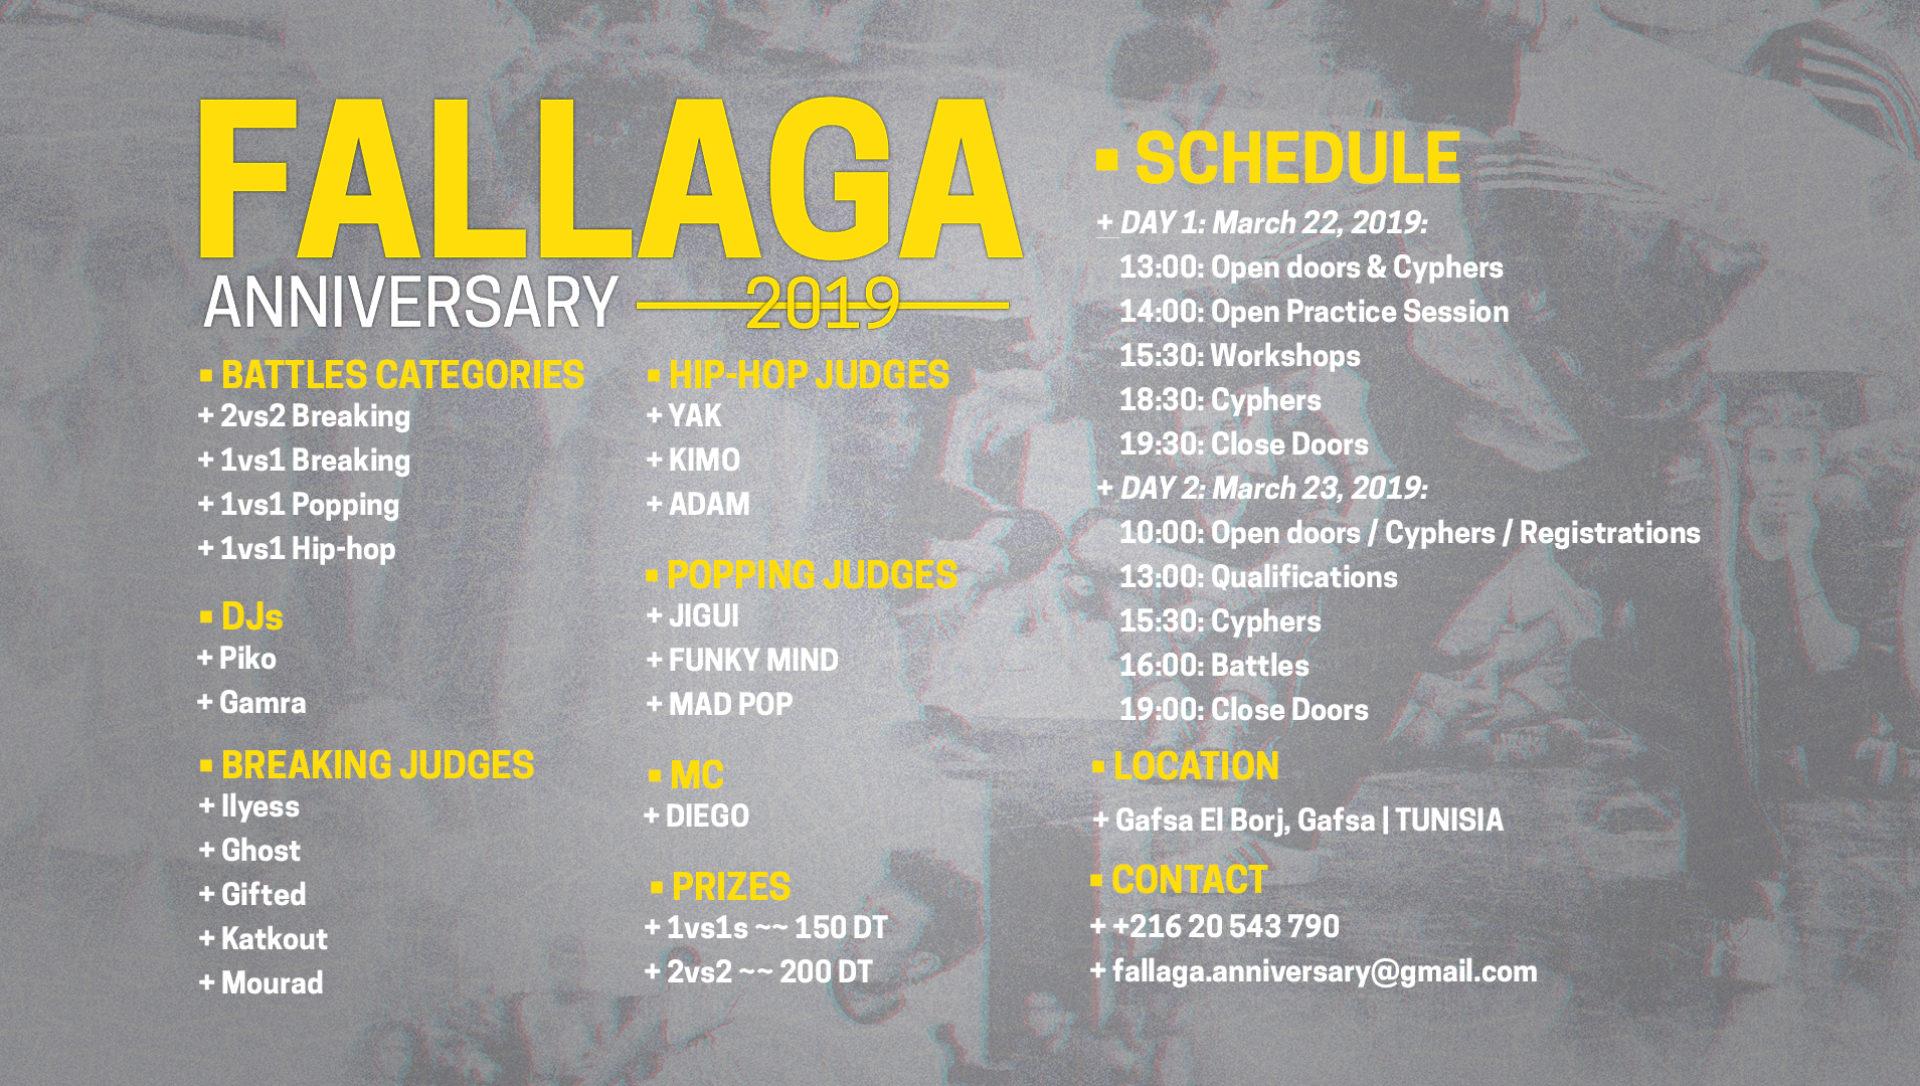 Fallaga Anniversary 2019